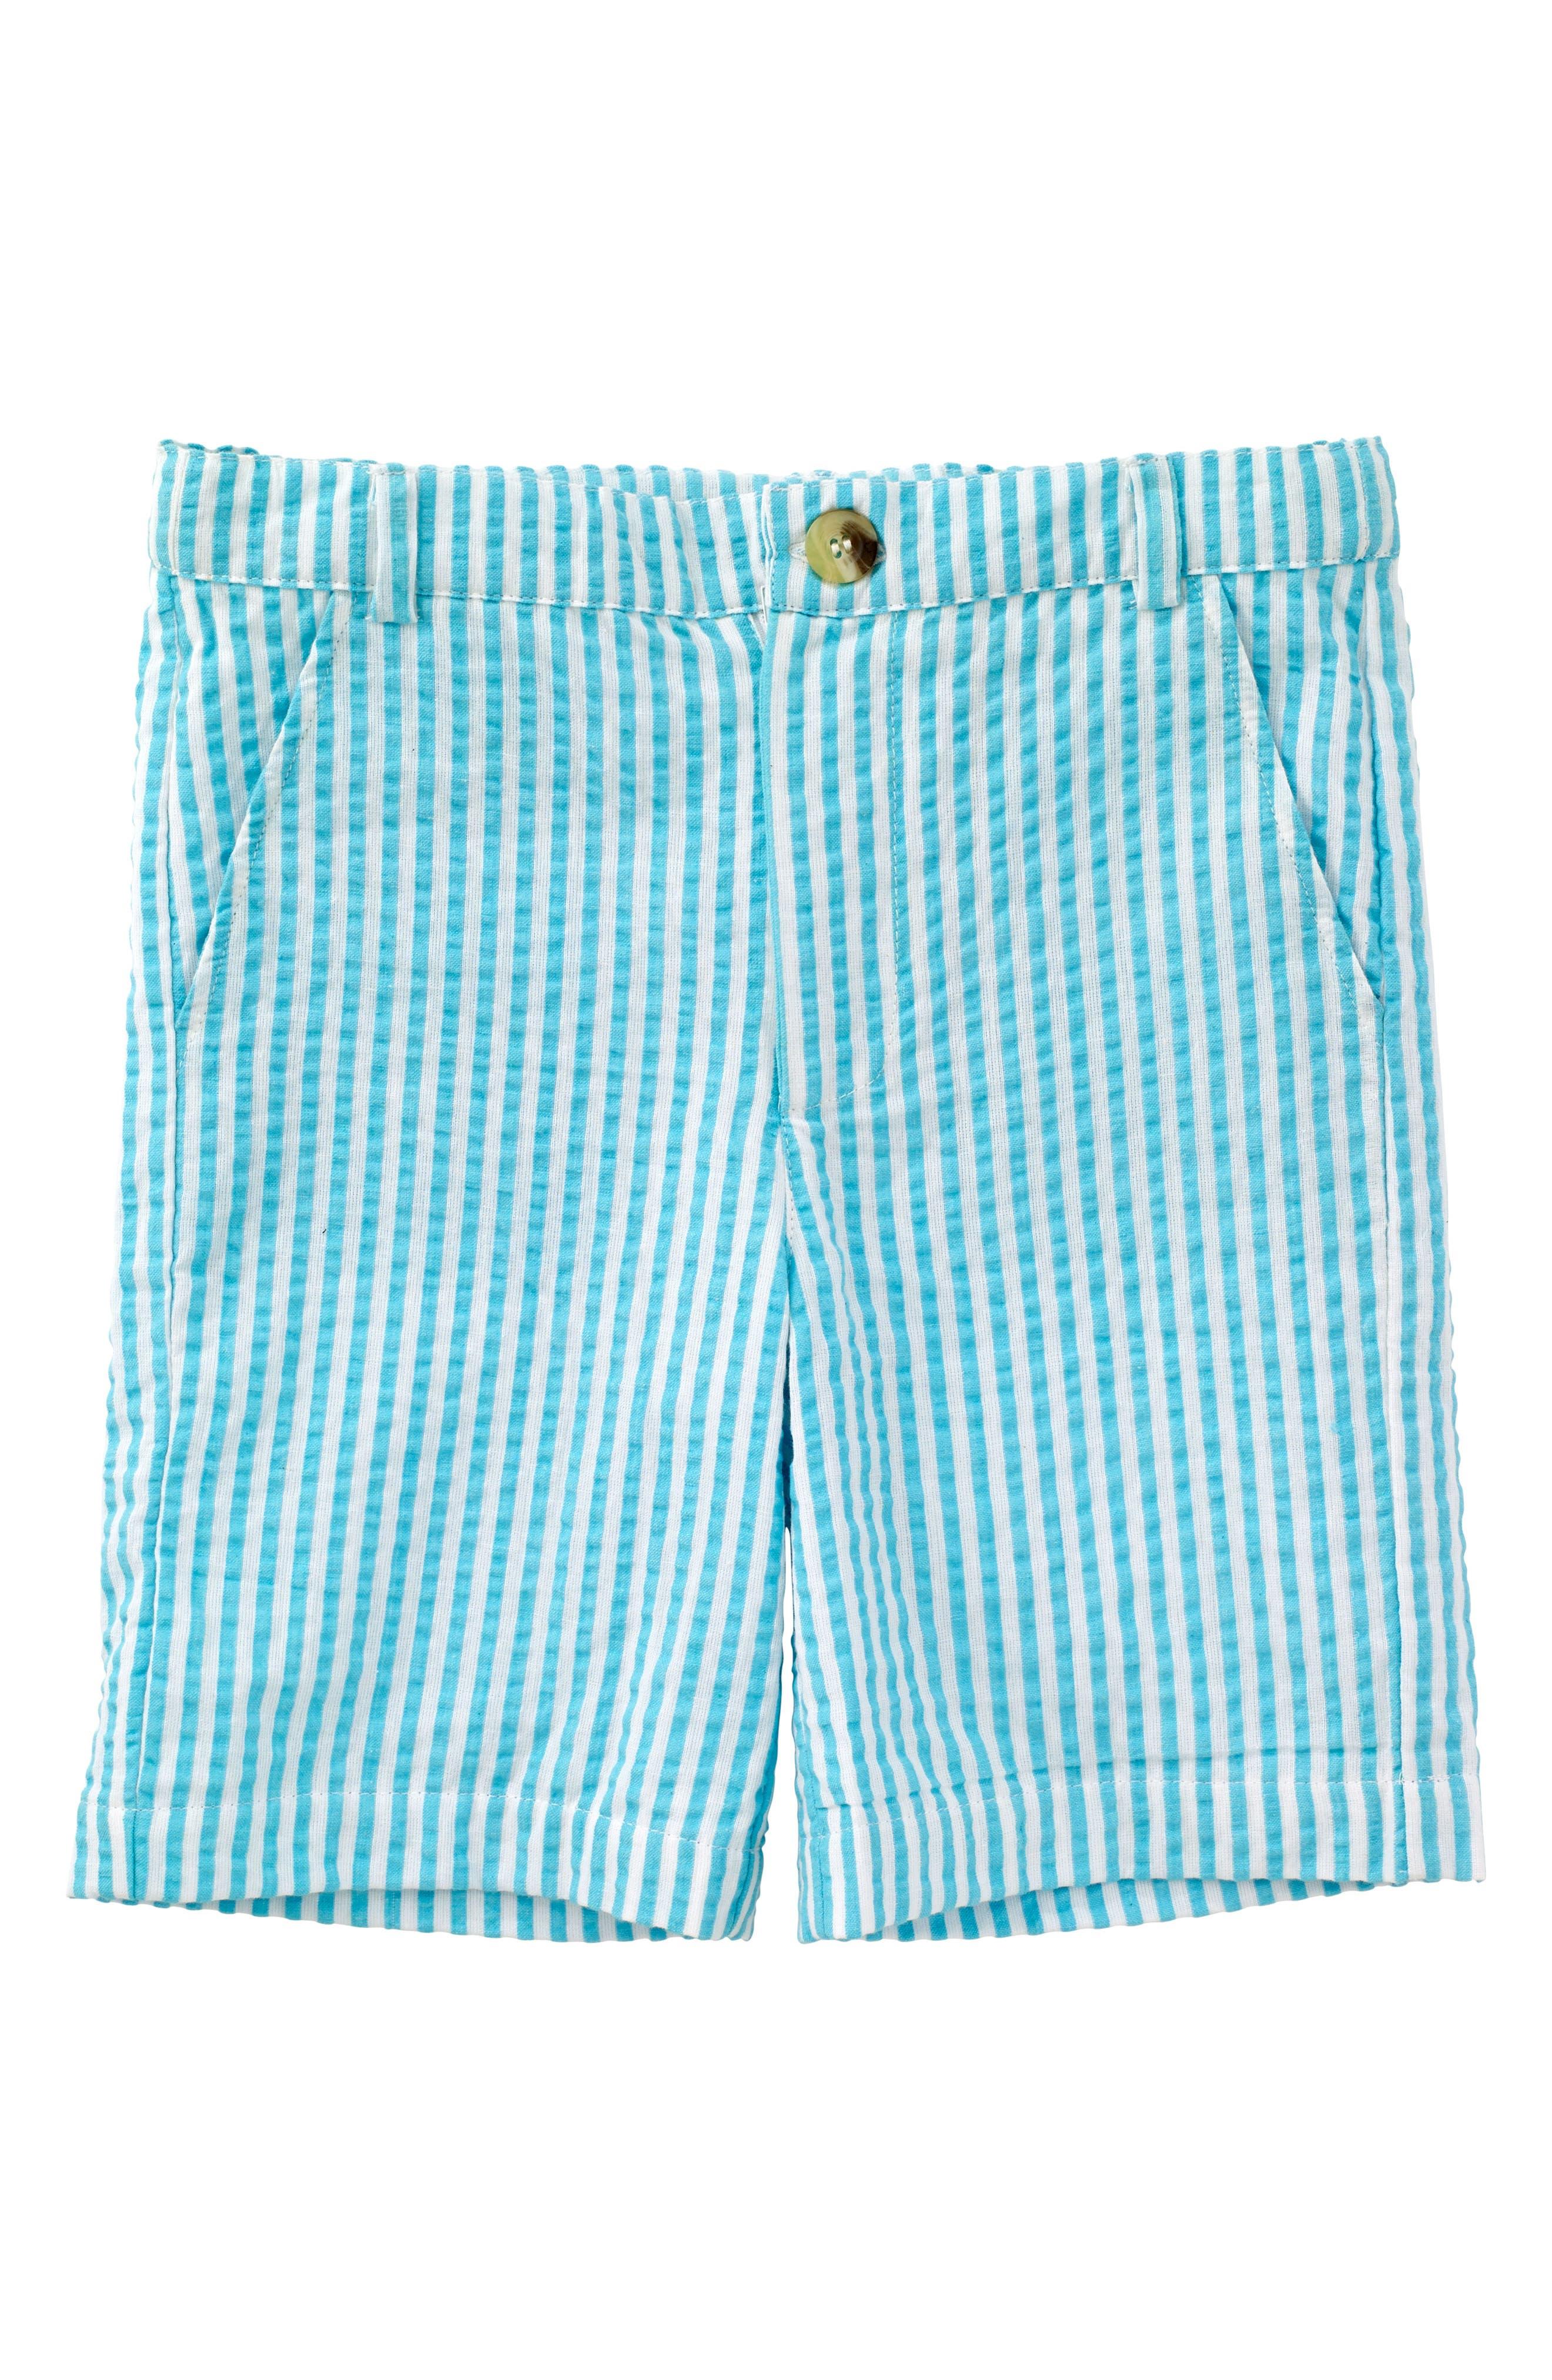 Masalababy Crosby Stripe Shorts,                         Main,                         color, 400